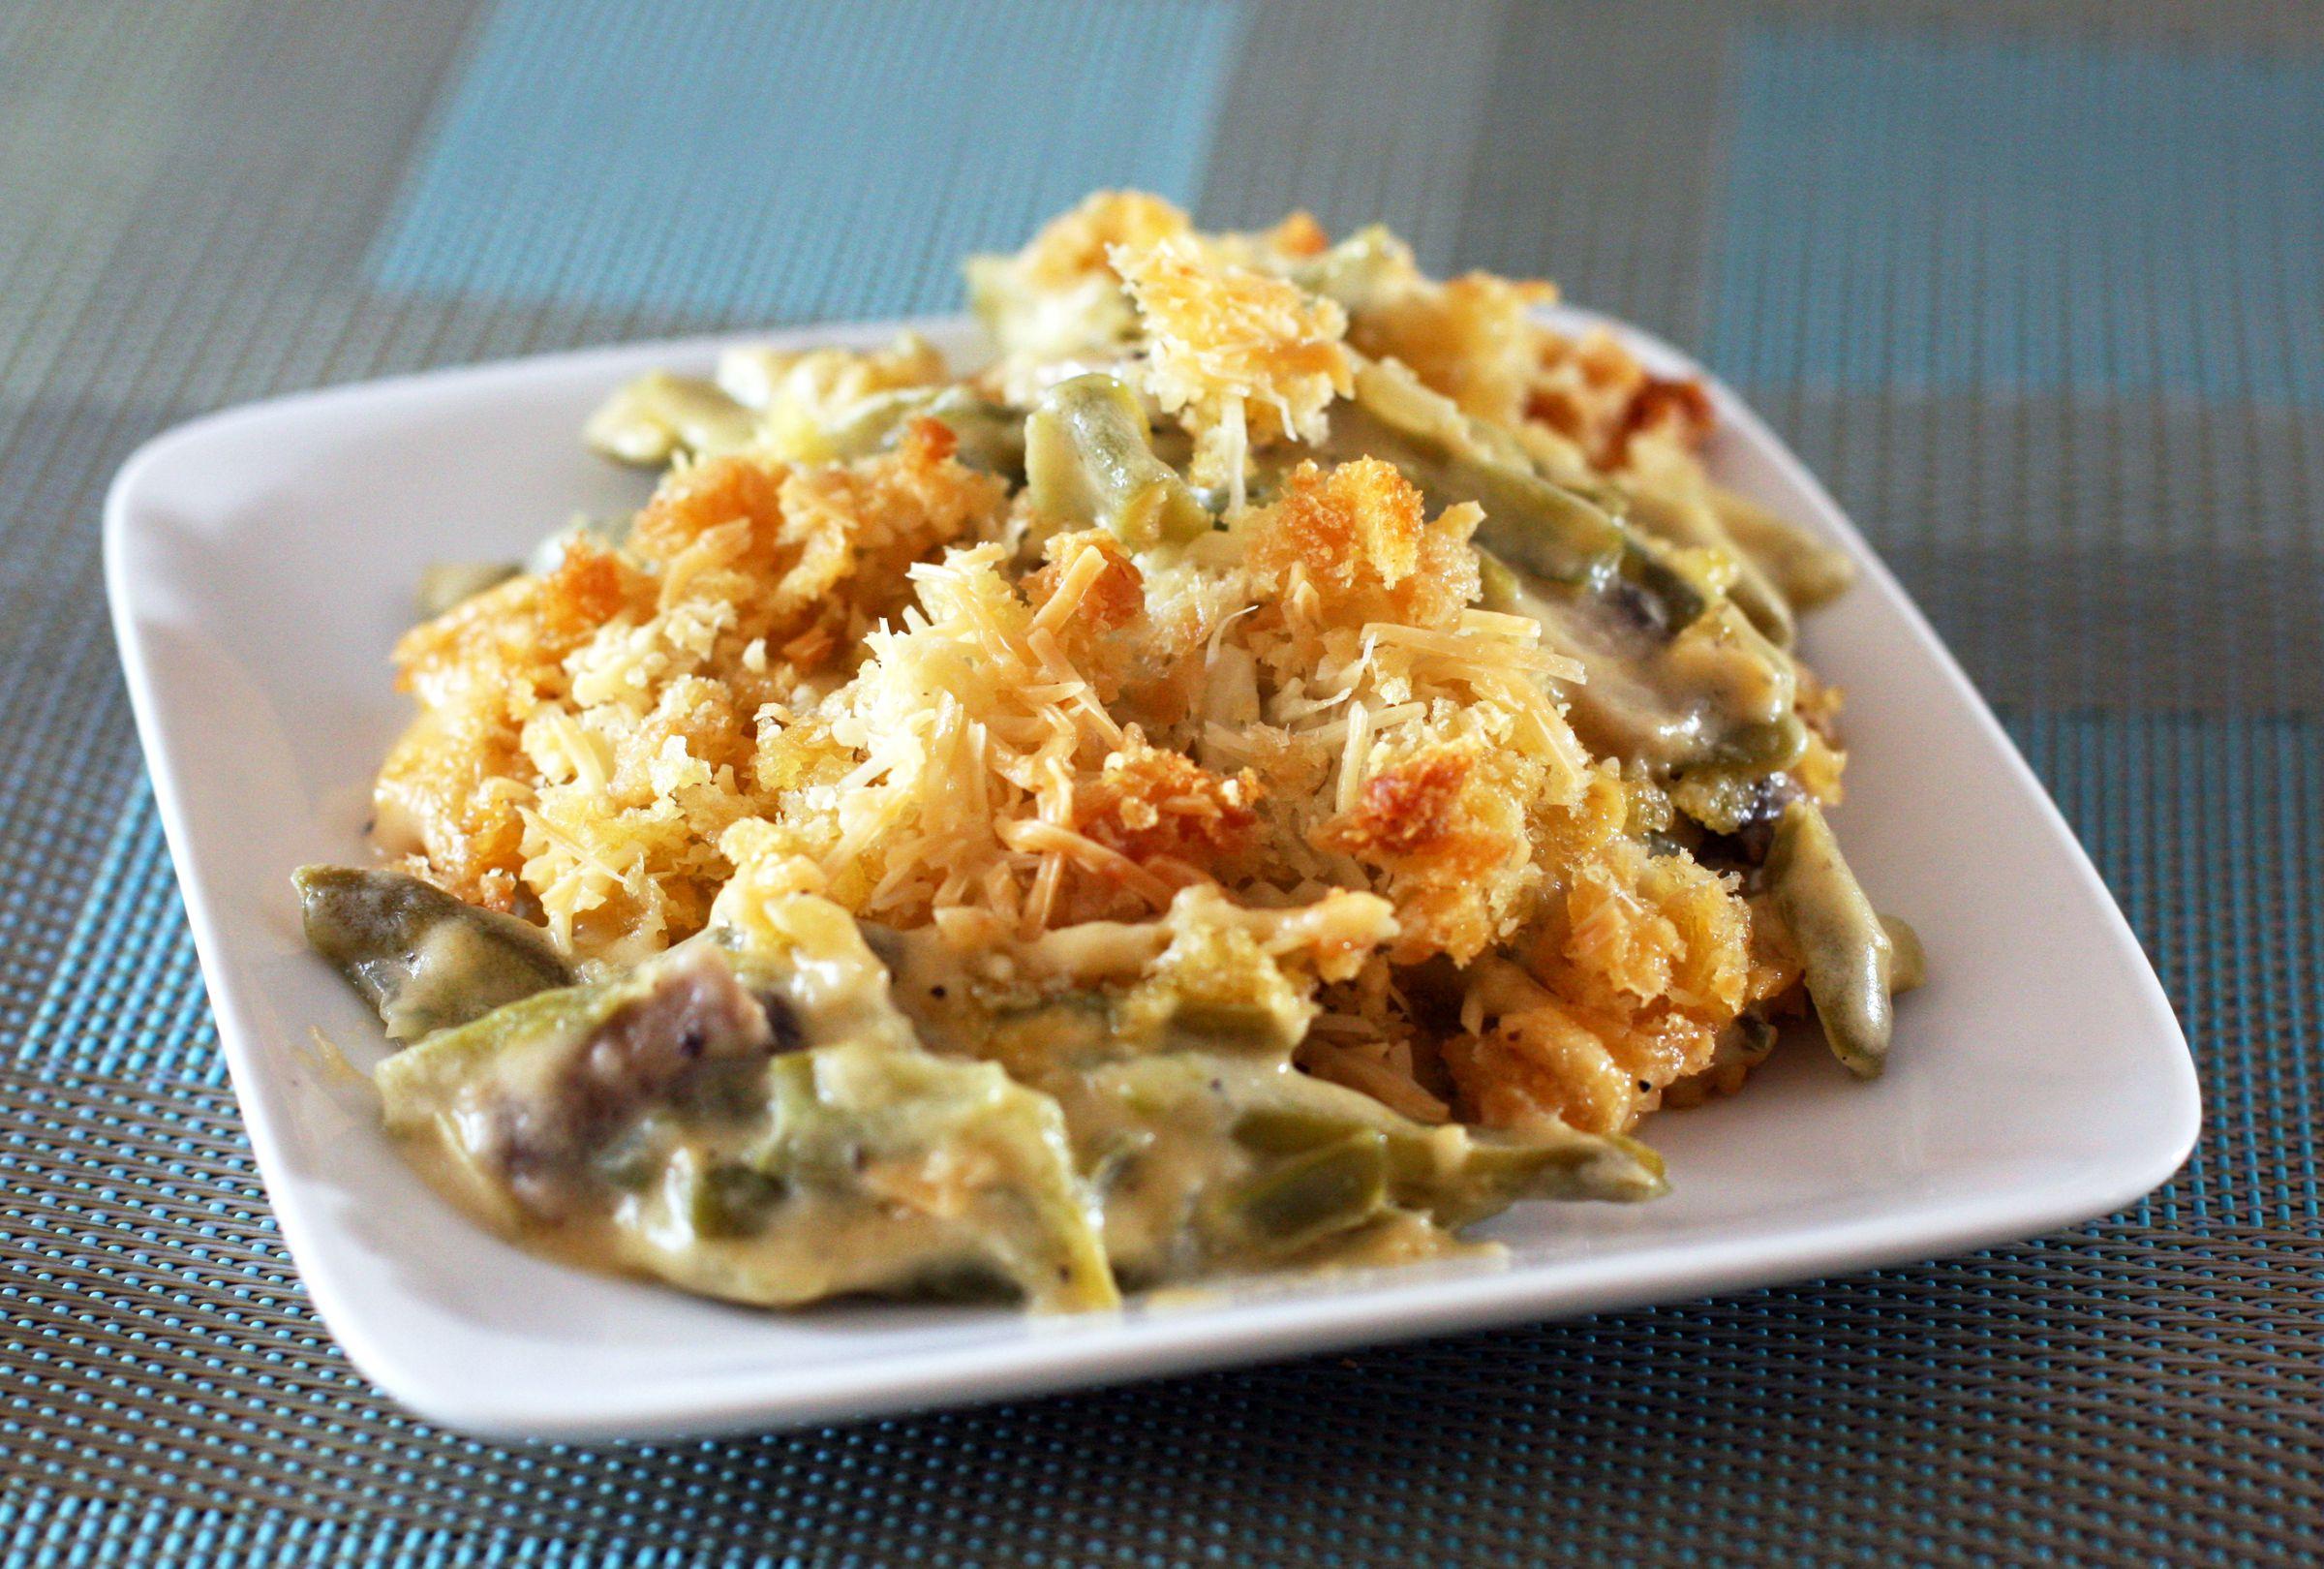 Homemade Cheddar Cheese Green Bean Casserole Recipe